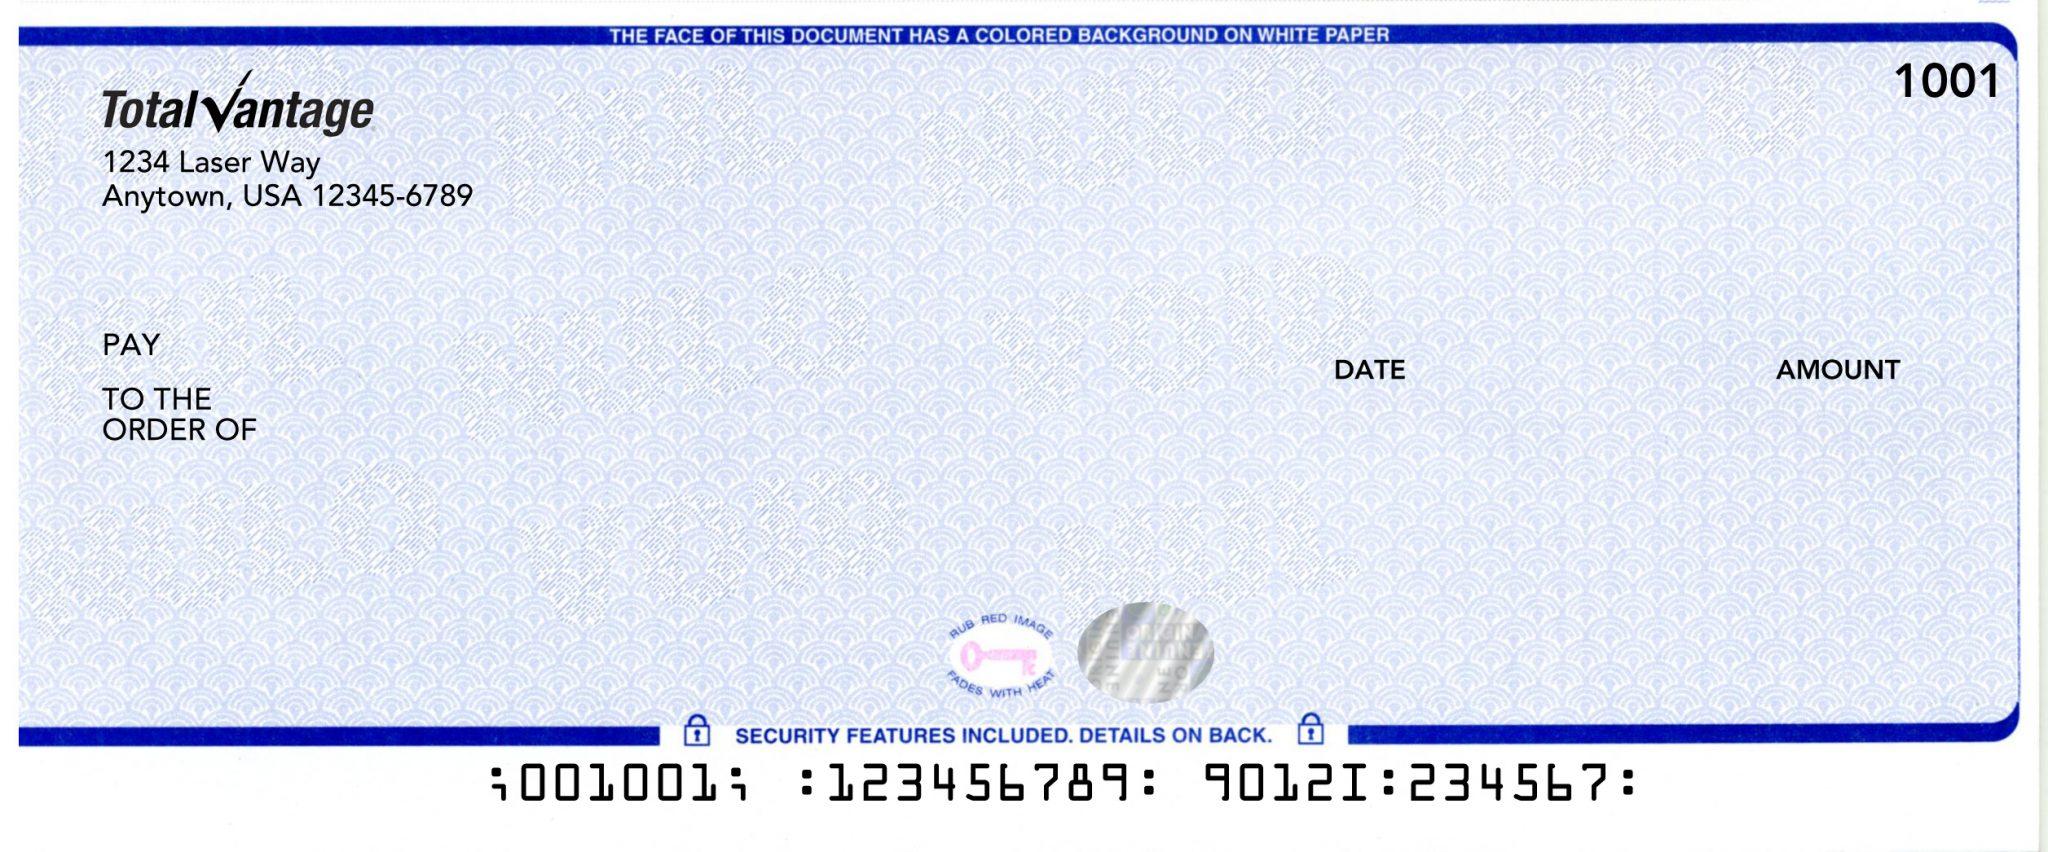 Hologram Imprinted Laser Checks Stock Checks